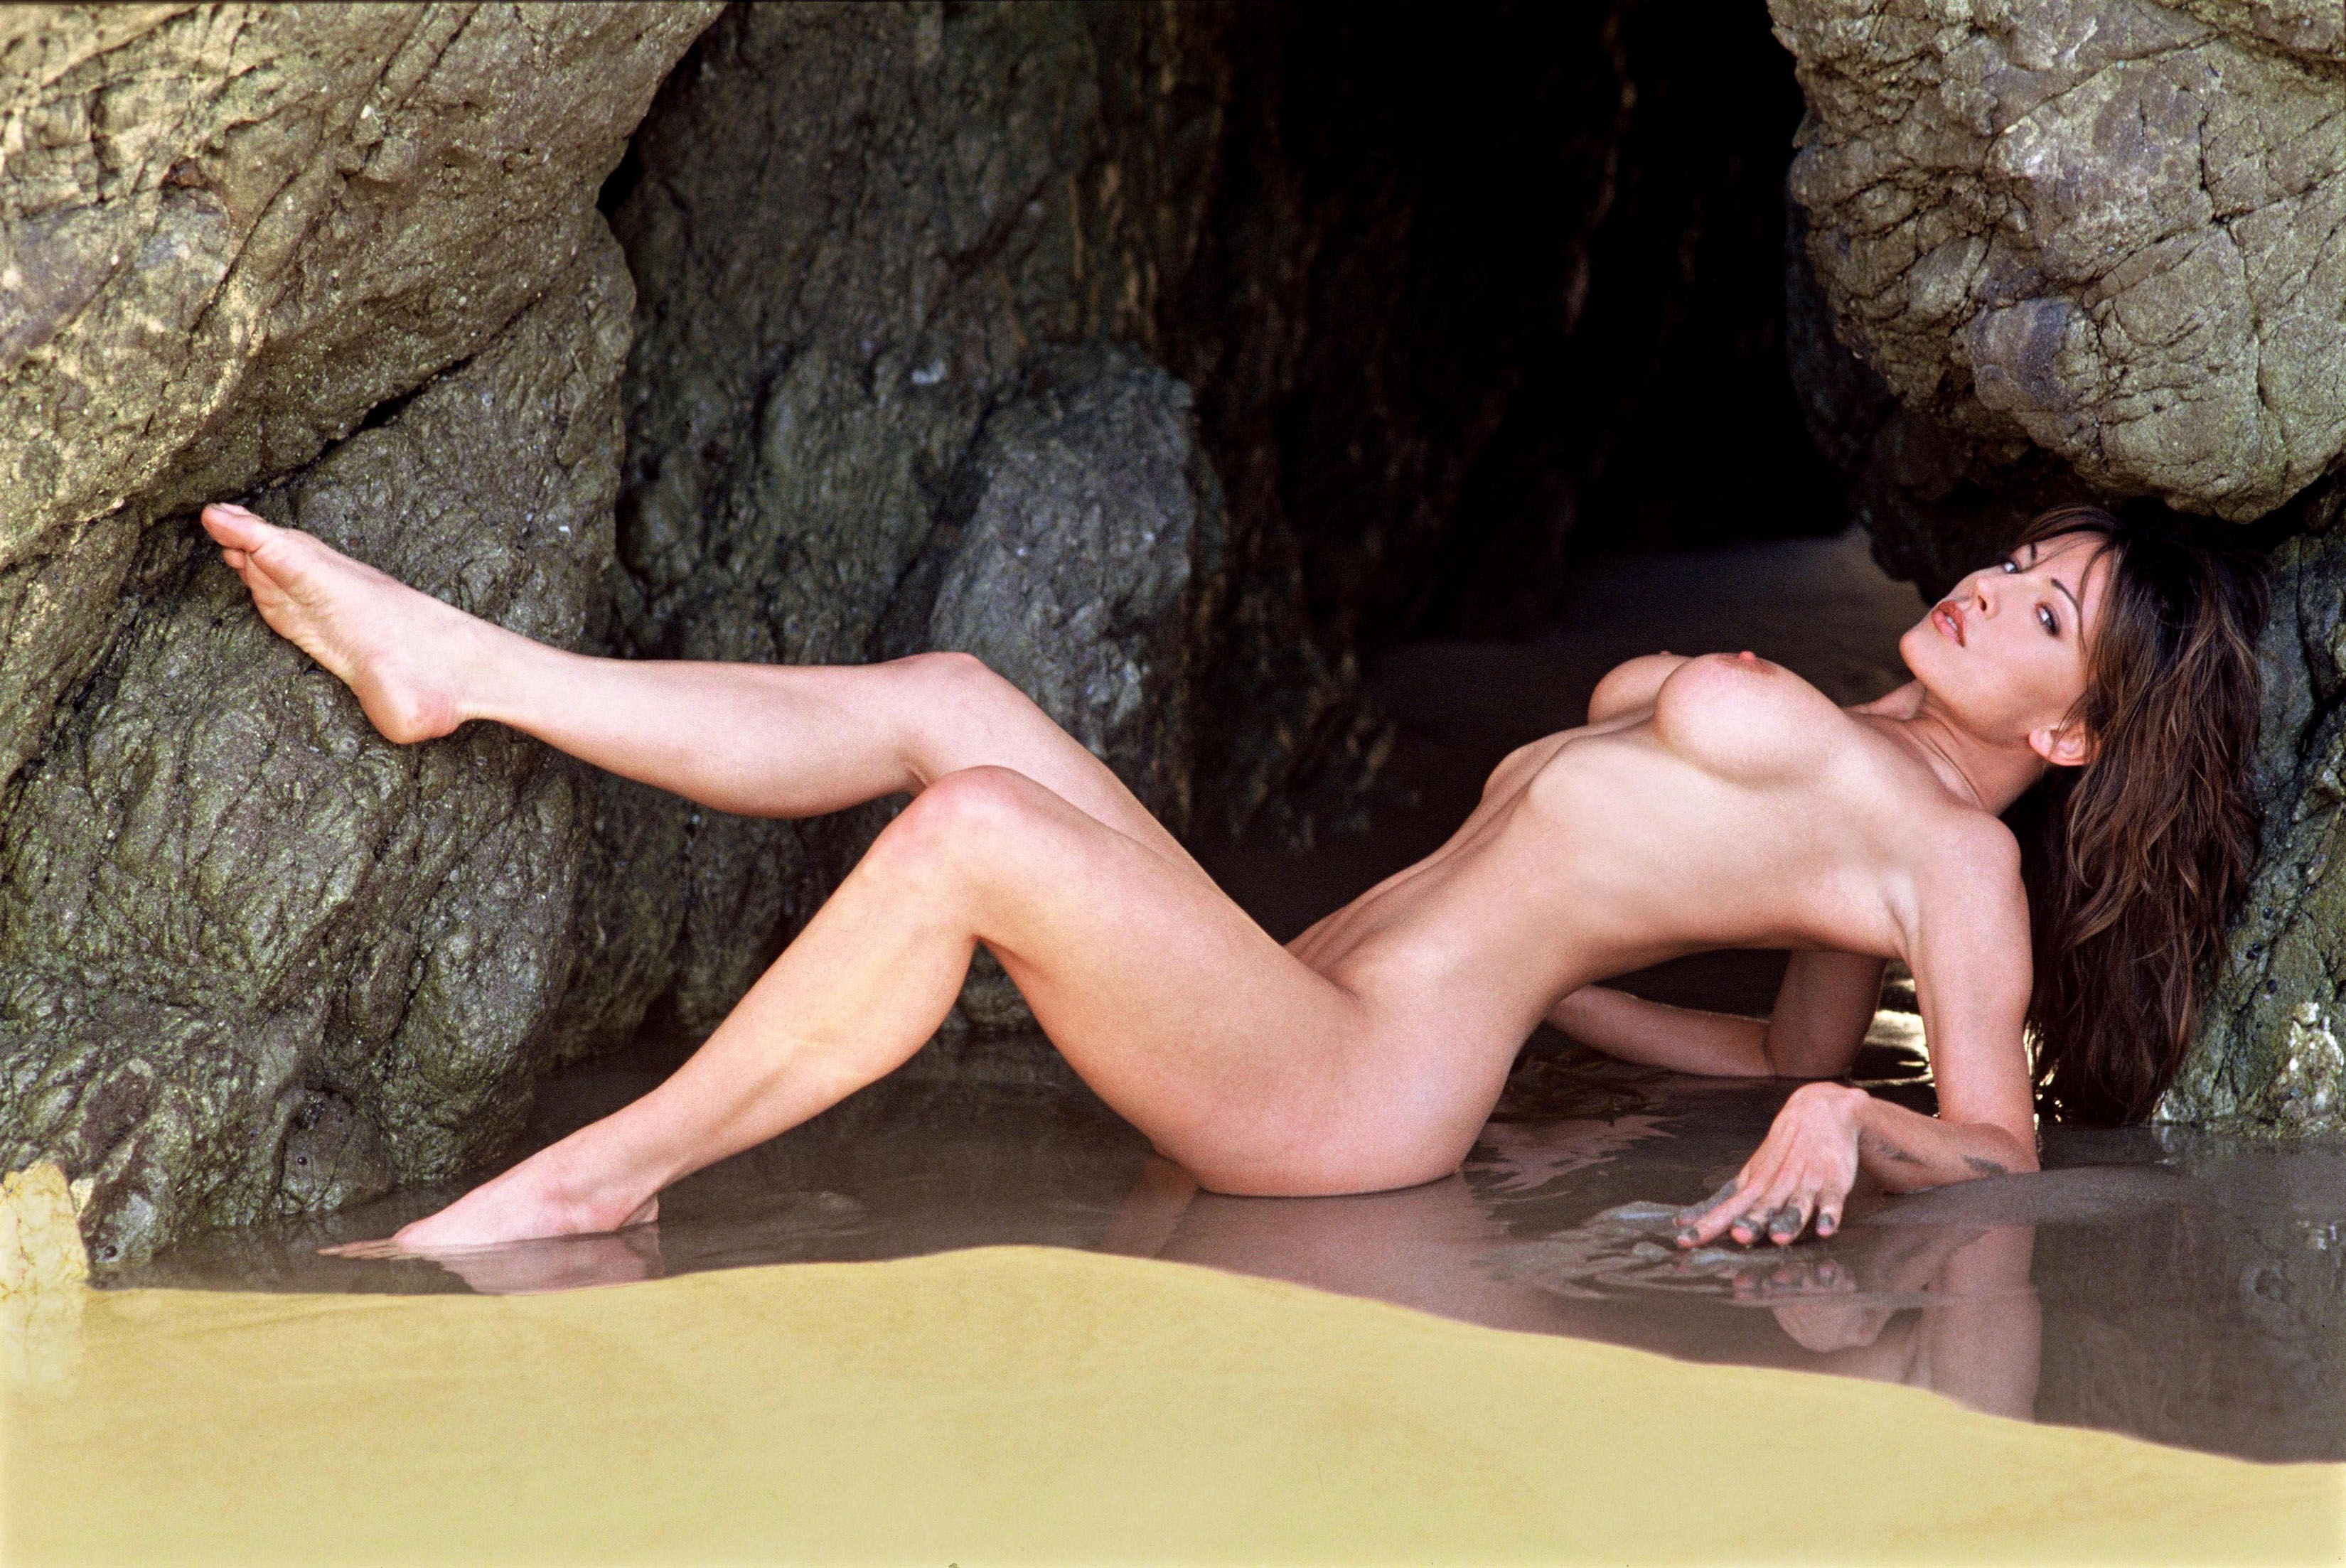 Krista allen nude naked authoritative message